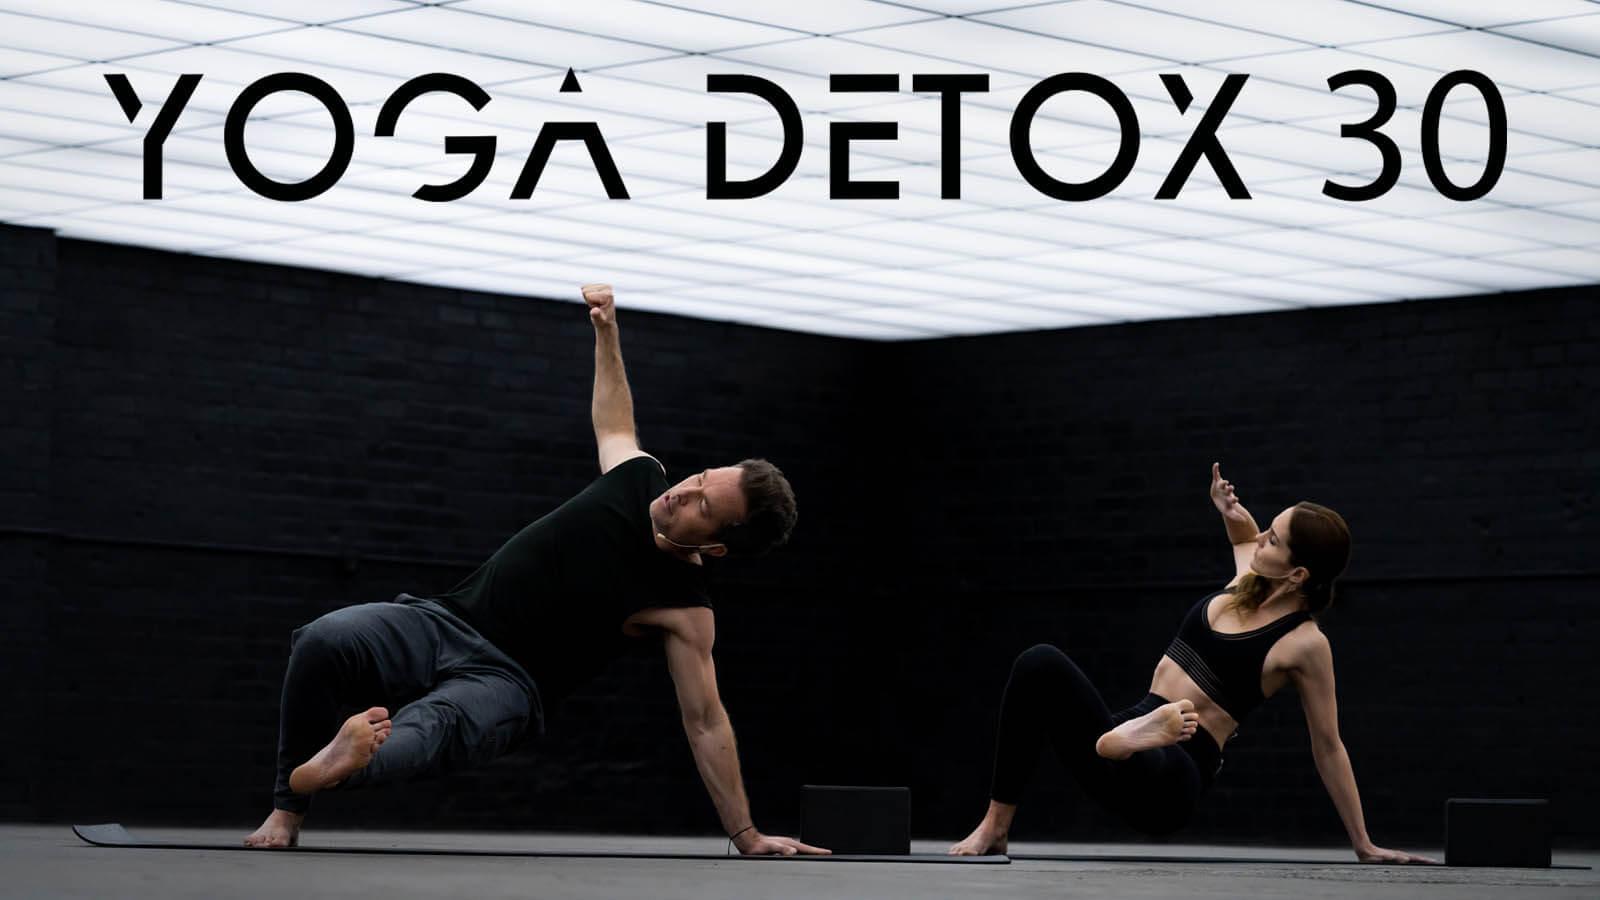 Detox Yoga Program